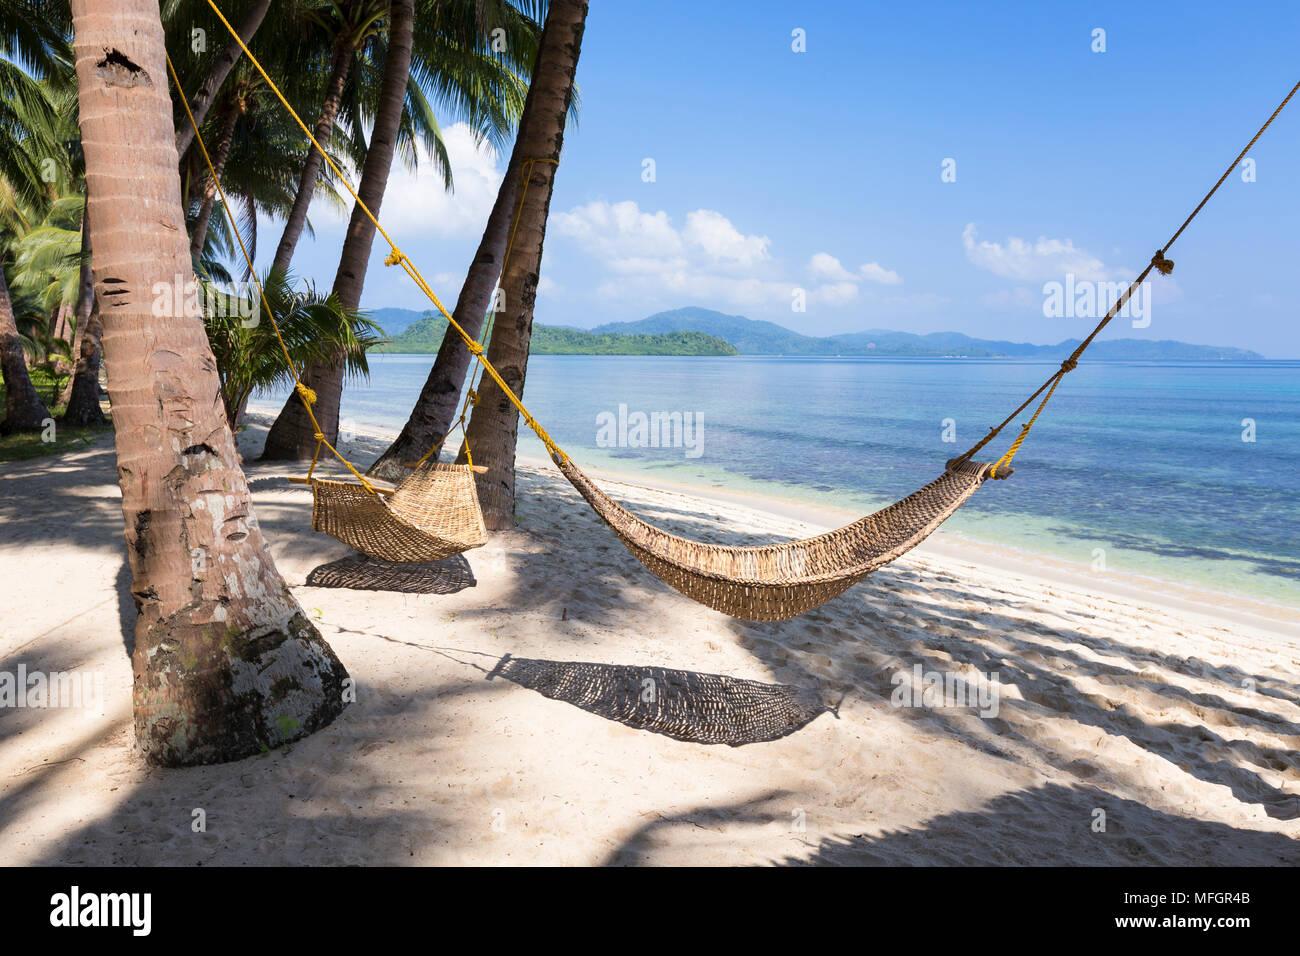 Hammock on tropical beach, white beach, near Port Barton, Palawan island, Philippines - Stock Image